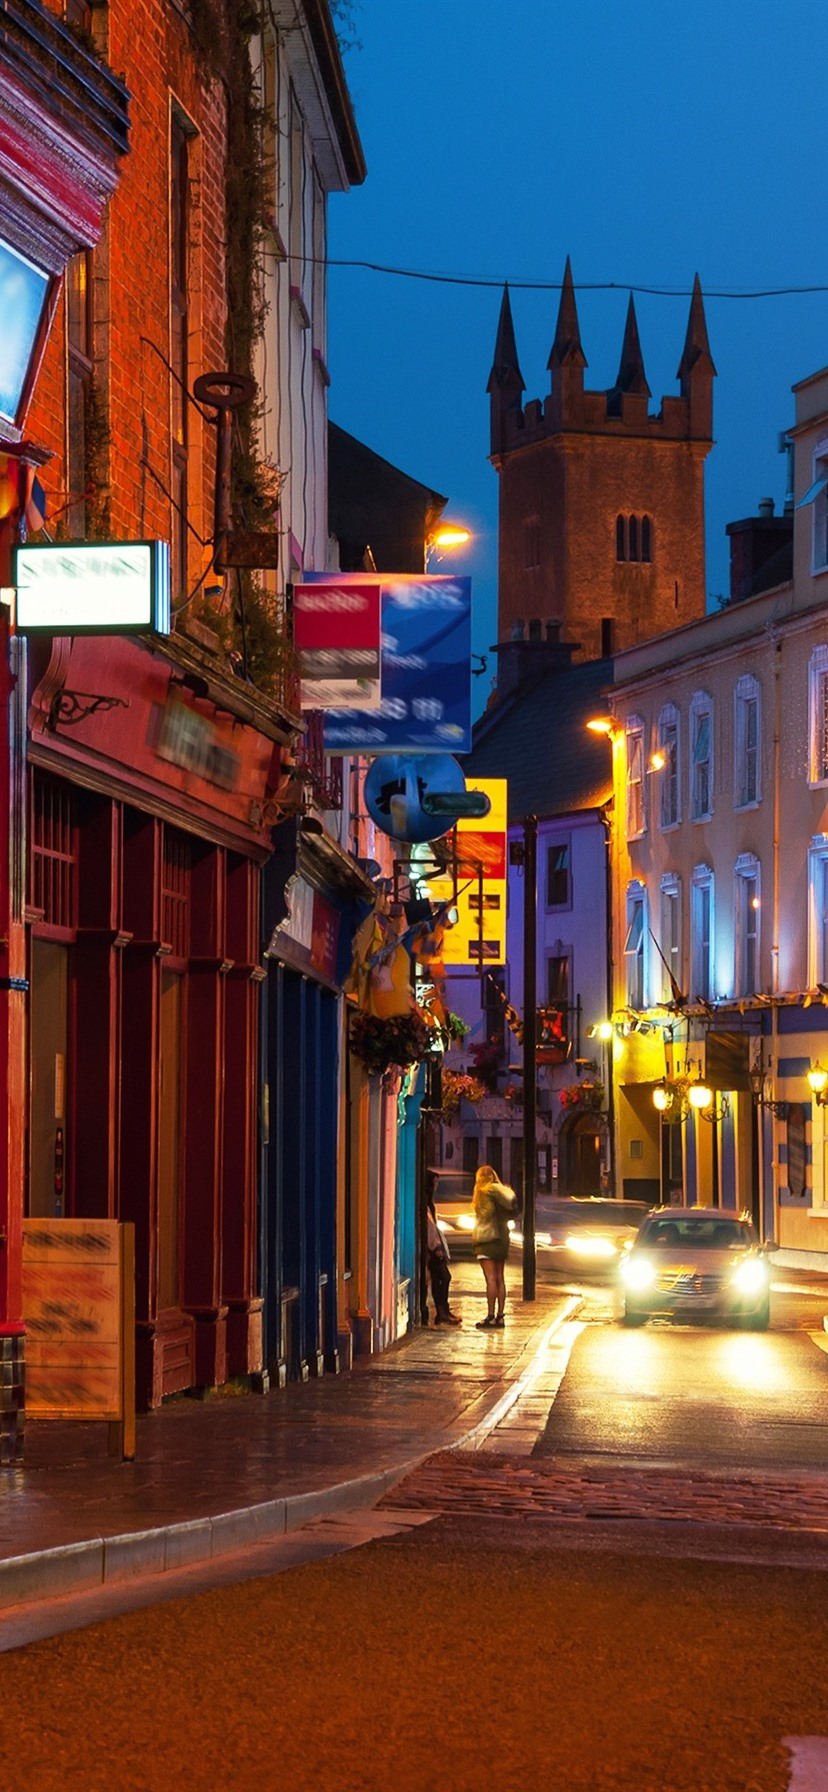 Ireland City At Night Houses Street Lights 828x1792